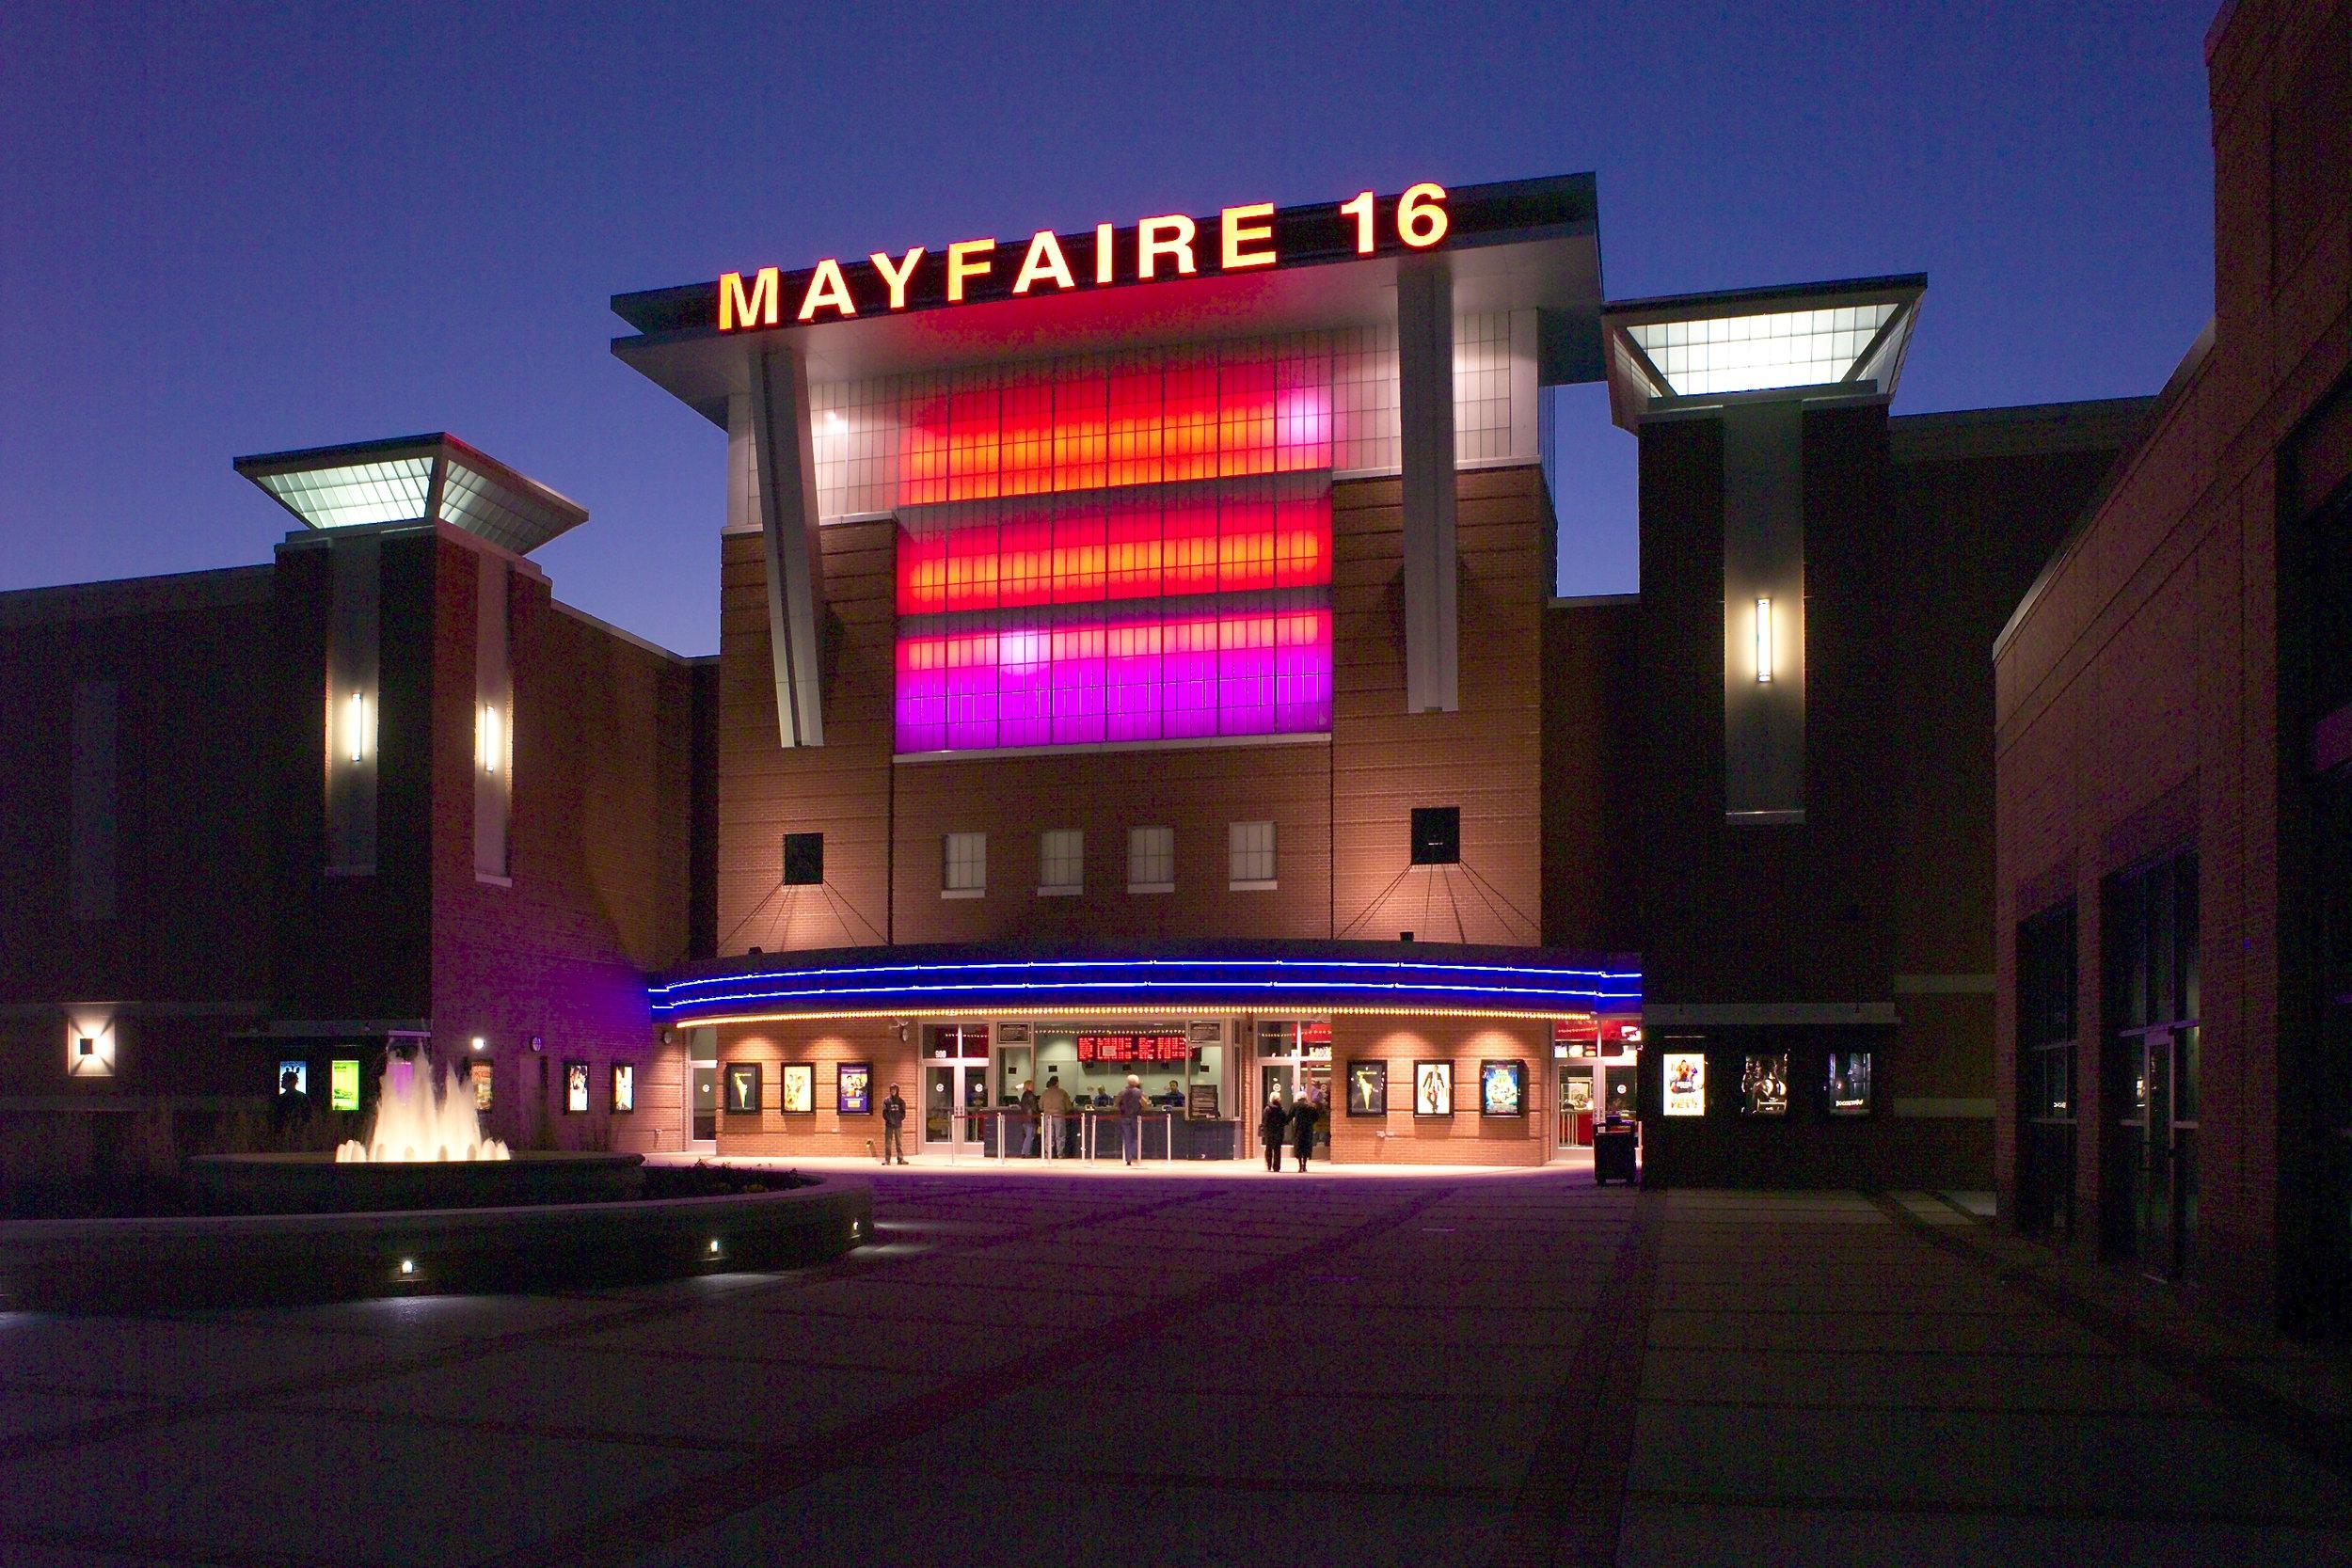 Mayfaire 16 - Wilmington, NC